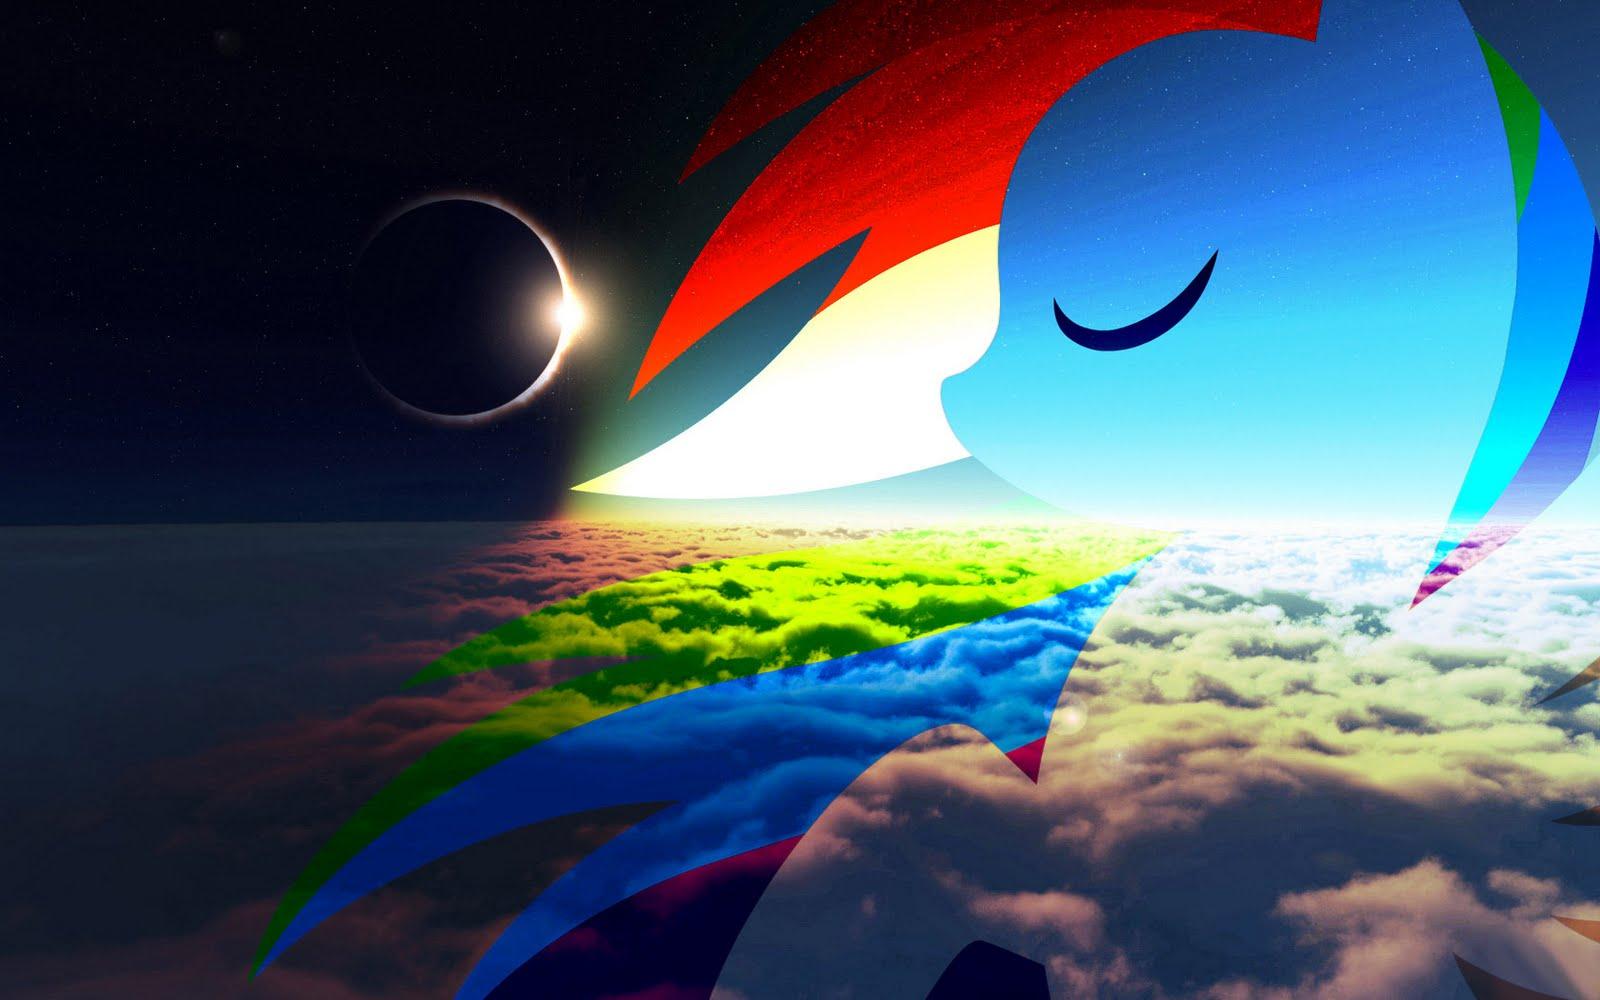 http://3.bp.blogspot.com/-MIdtwvQ4QHg/TiuVjiWDZcI/AAAAAAAABB4/Cokoad3G_7U/s1600/35013%2B-%2Bclear%2Brainbow_dash%2Bsky%2Bwallpaper.jpg